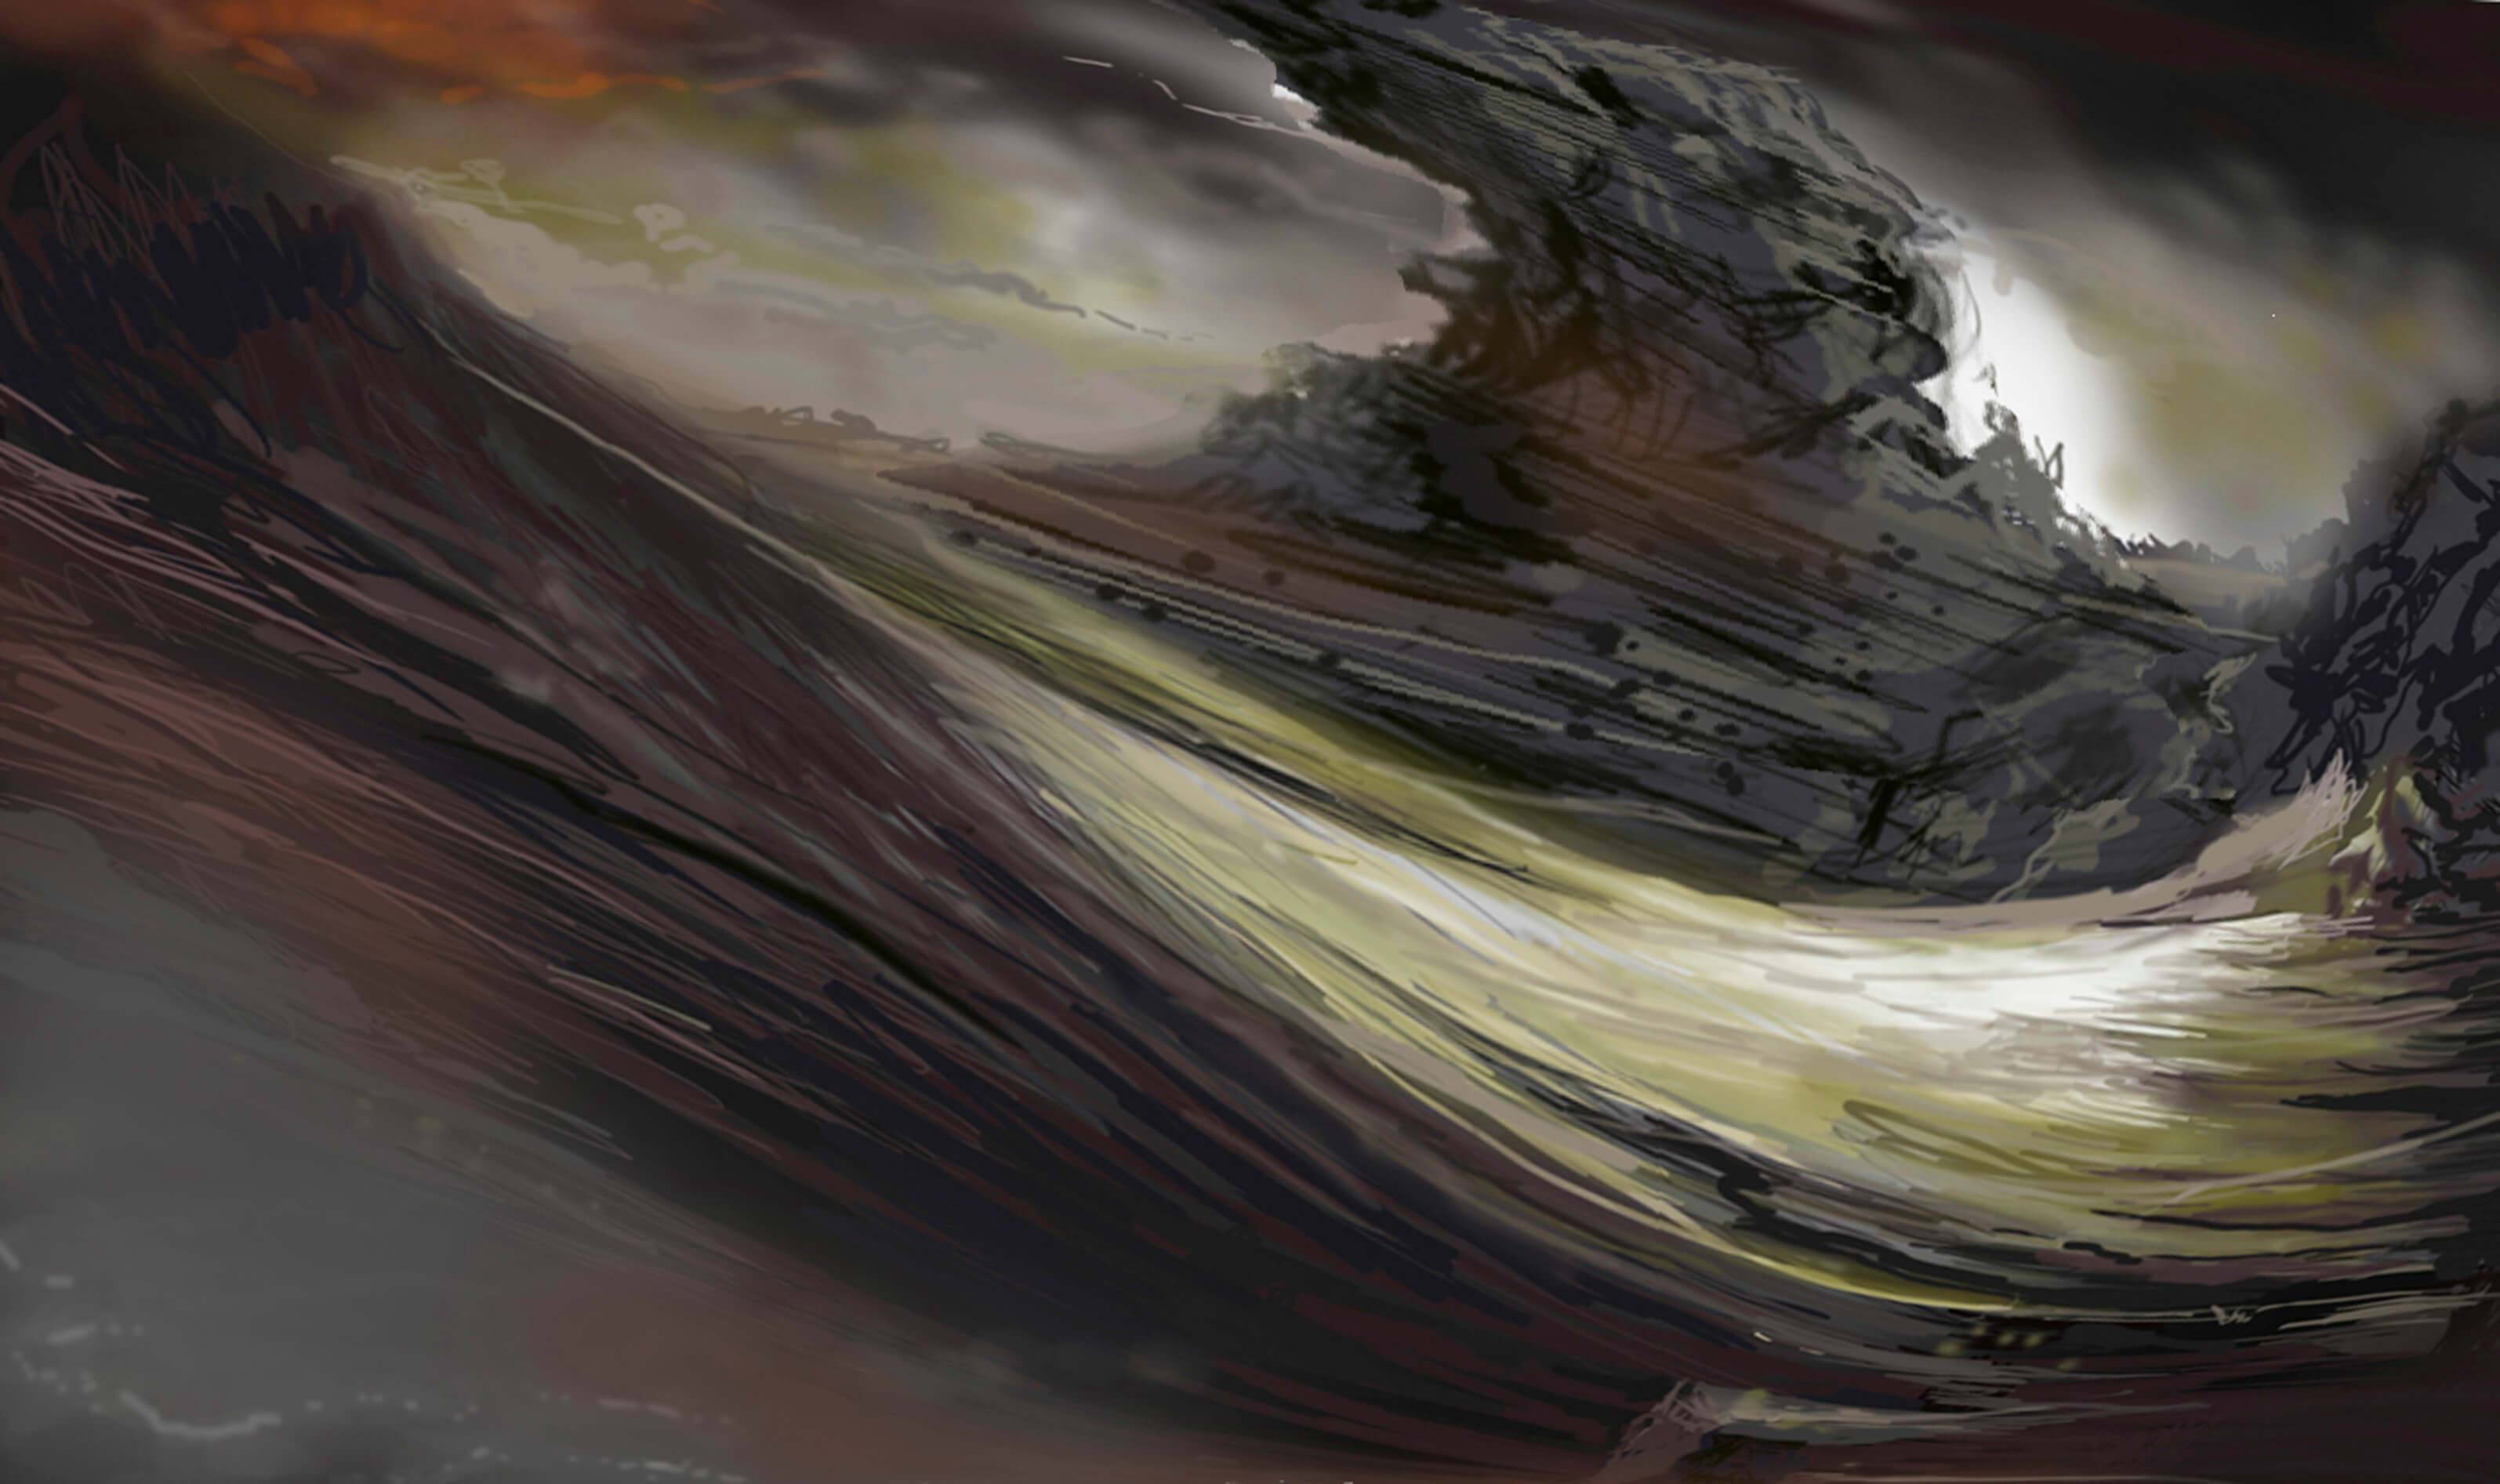 Title: Sketch of a Marine Media: Digital Painting Size: 27 x 16 cm 150 dpi Year: 2018